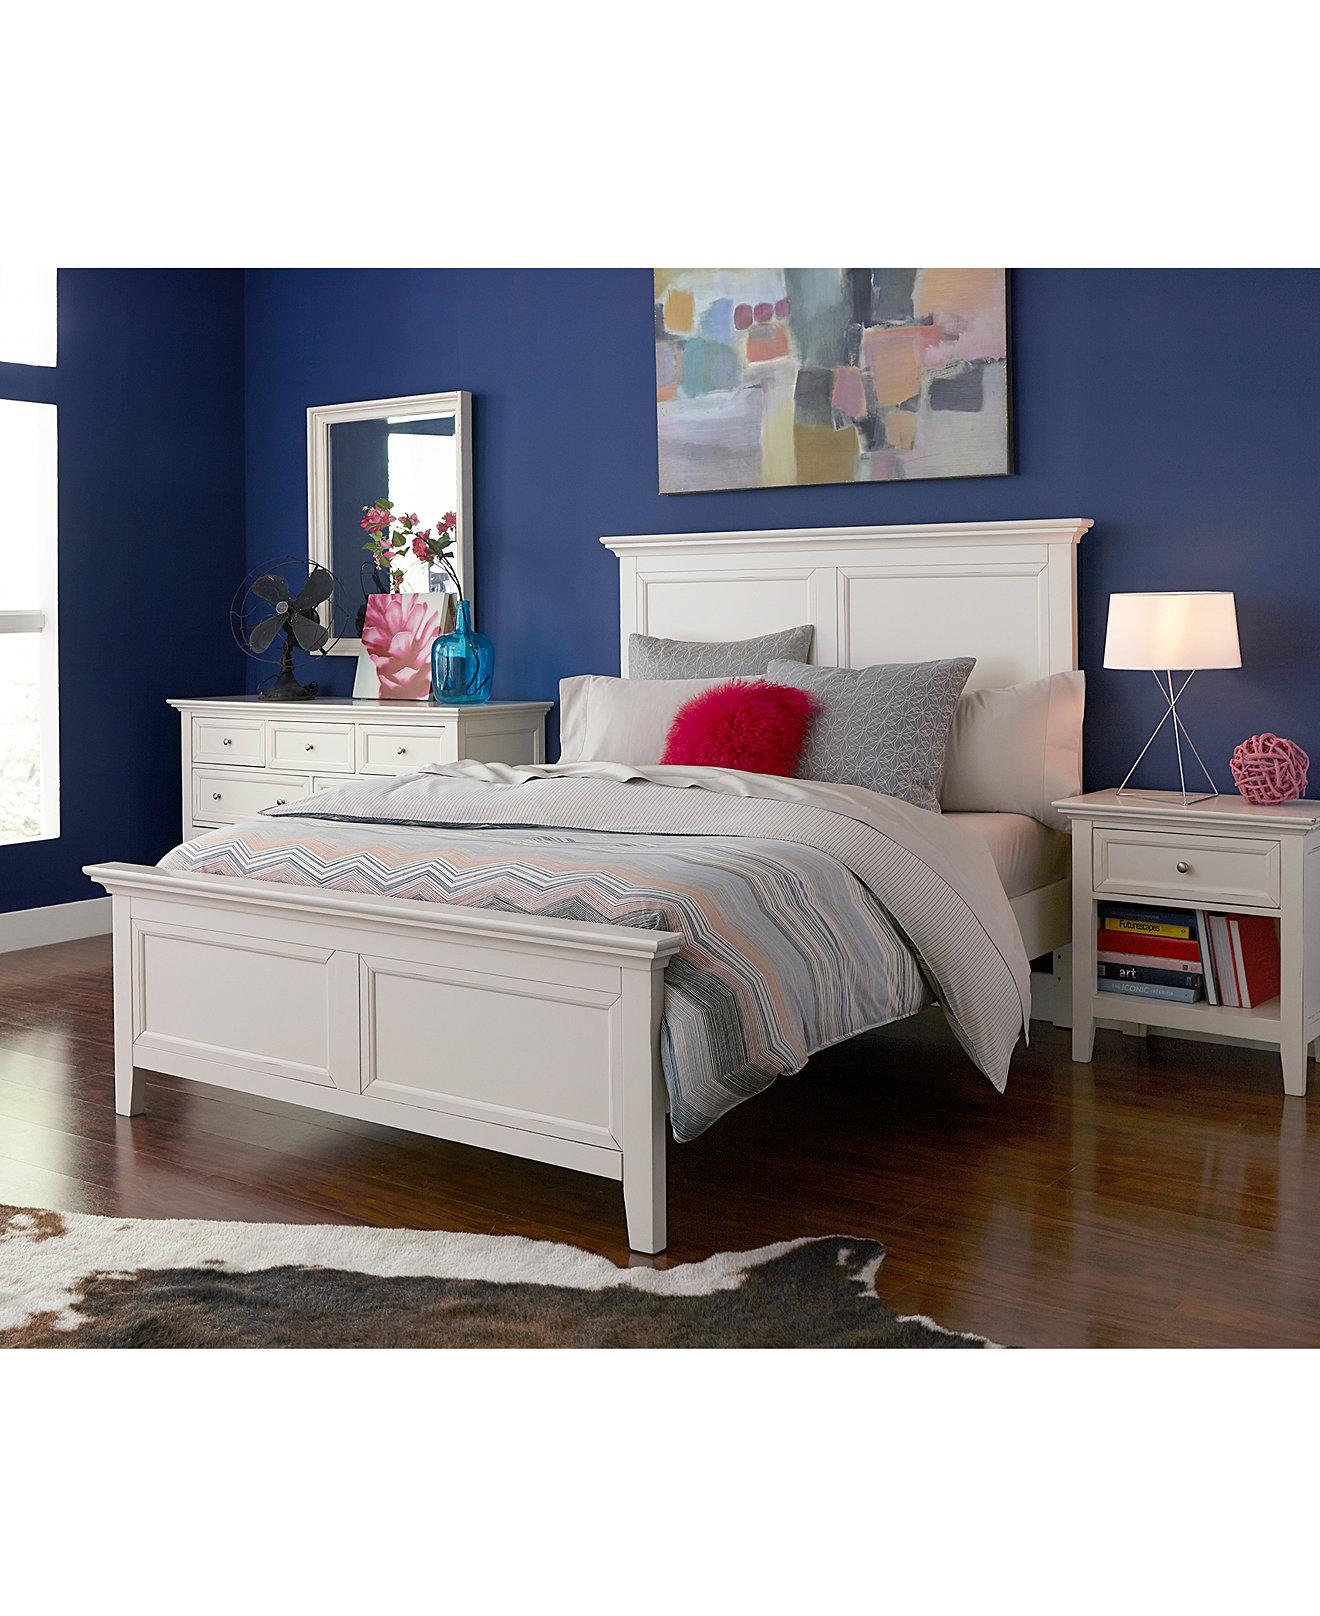 Macy Bedroom Furniture Closeout Sanibel Bedroom Furniture Collection Only At Macys Furniture